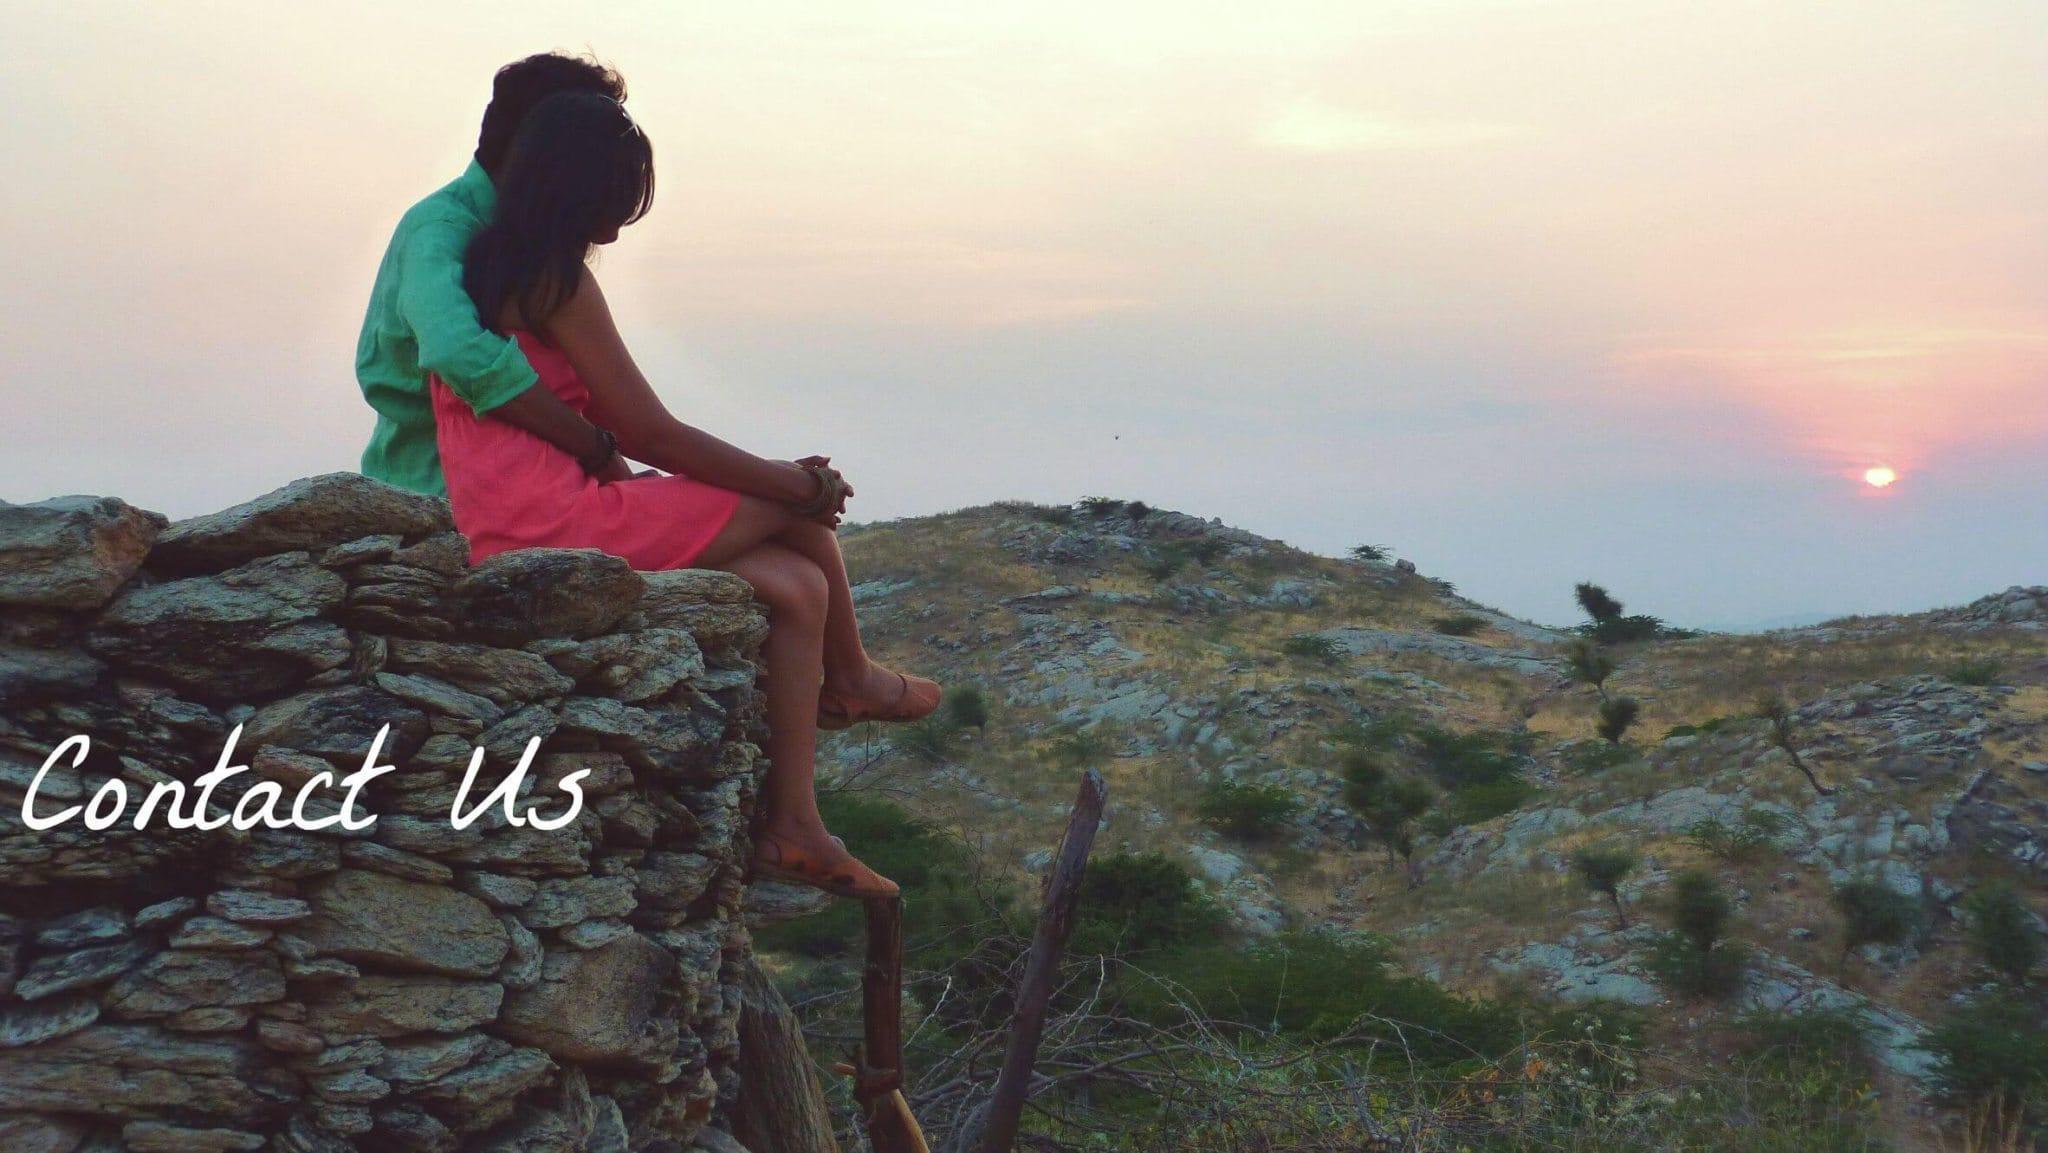 Contact us | Gypsycouple | Luxury Travelers | Couple travel bloggers